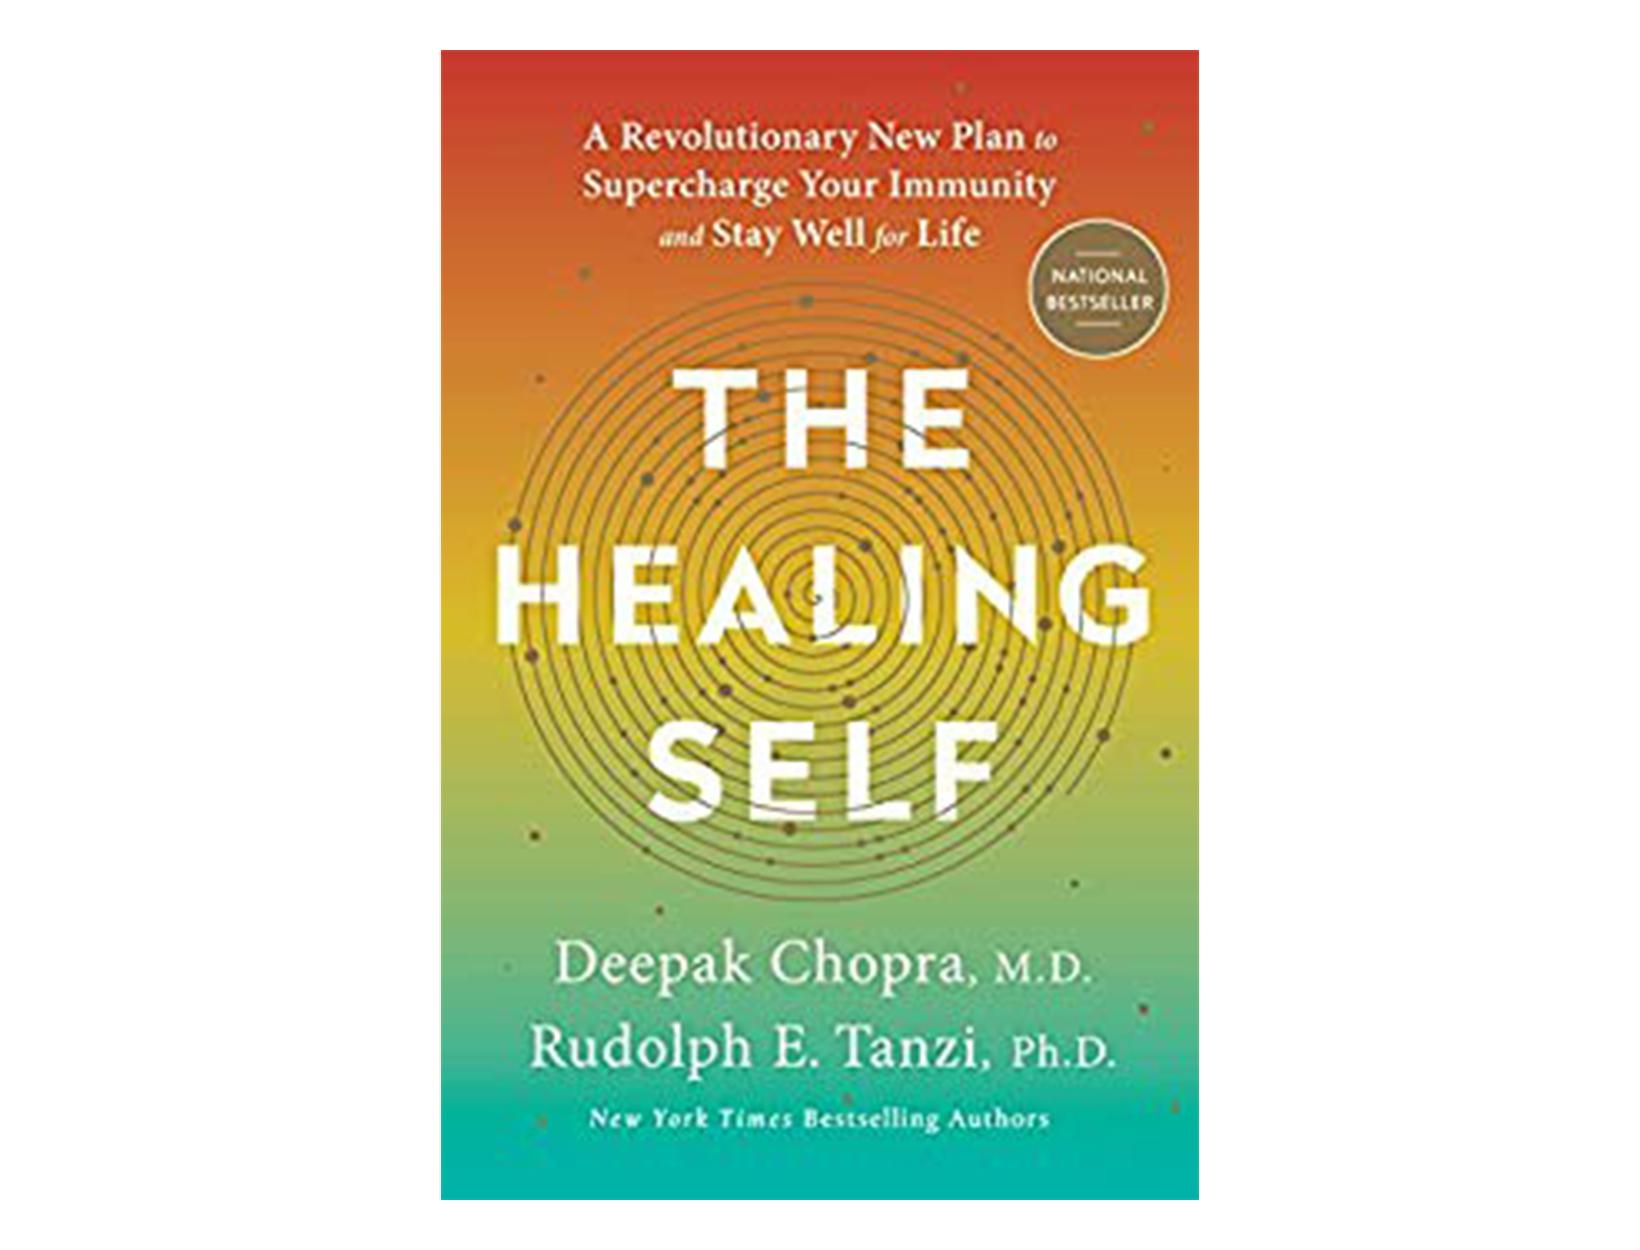 <em>The Healing Self</em> by Deepak Chopra, MD, and Rudolph E. Tanzi, PhD